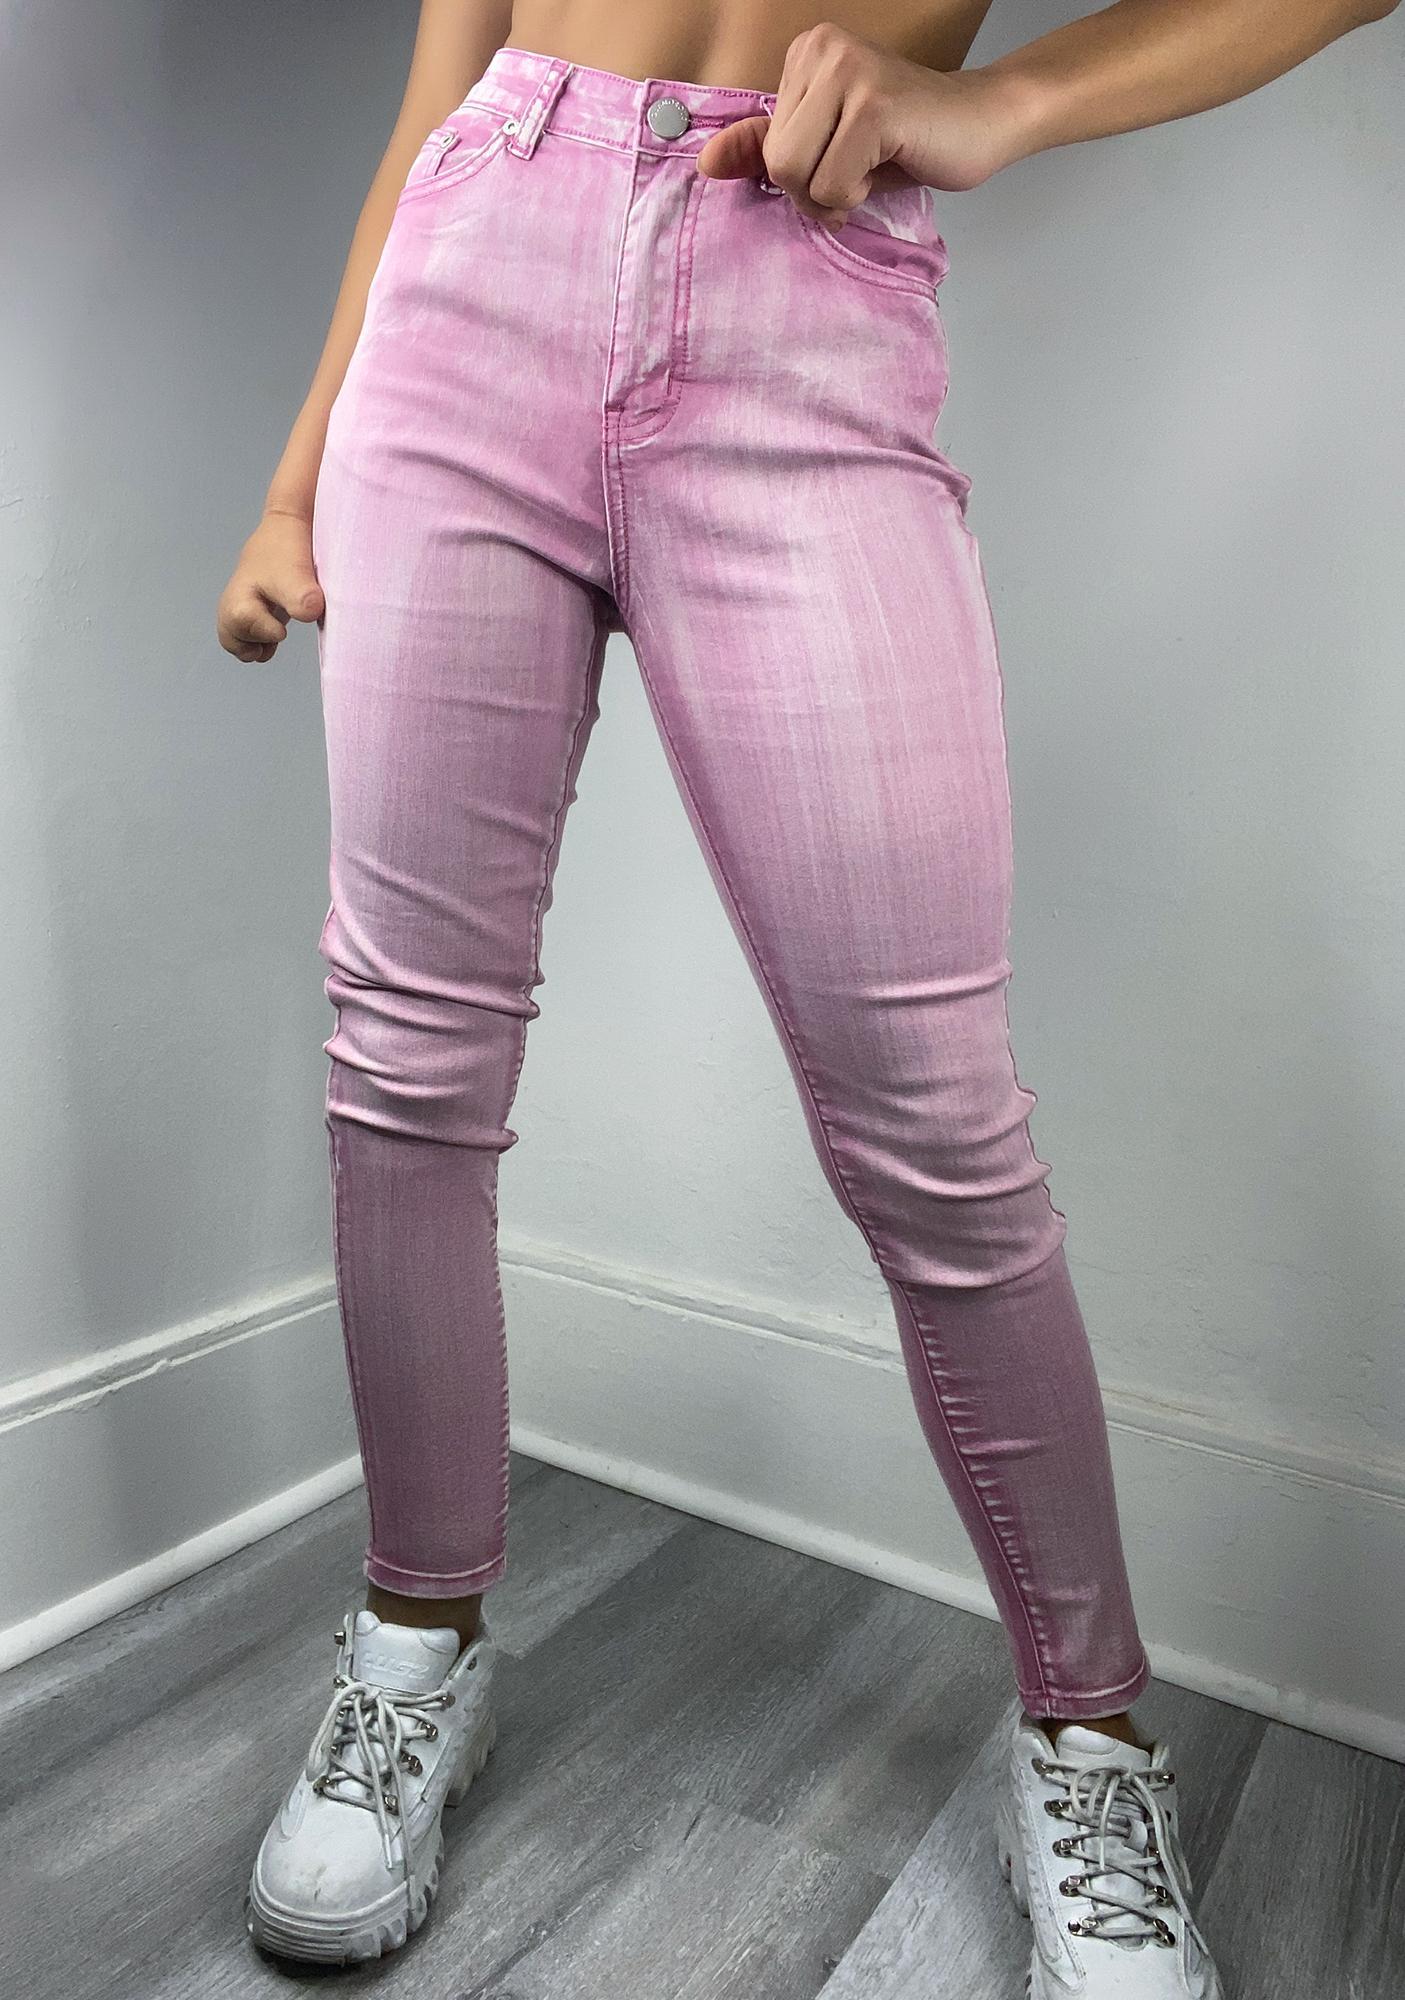 Glamorous Pink Acid Wash Skinny Jeans